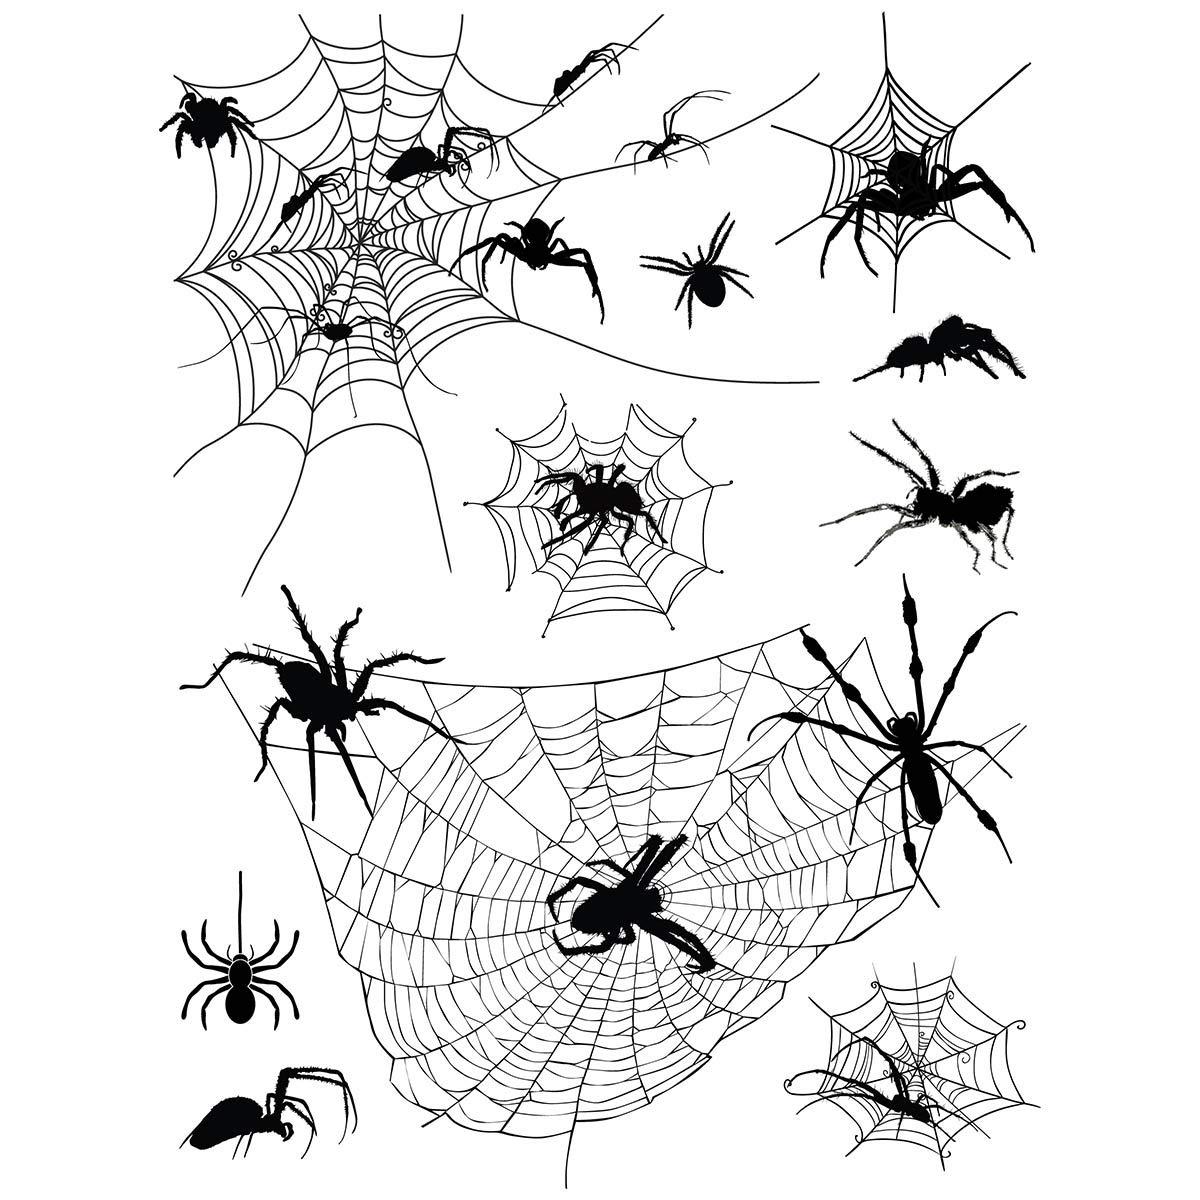 Supperb Temporary Tattoos - Halloween Face Tattoos Horror Cobweb Spider Web Tattoo